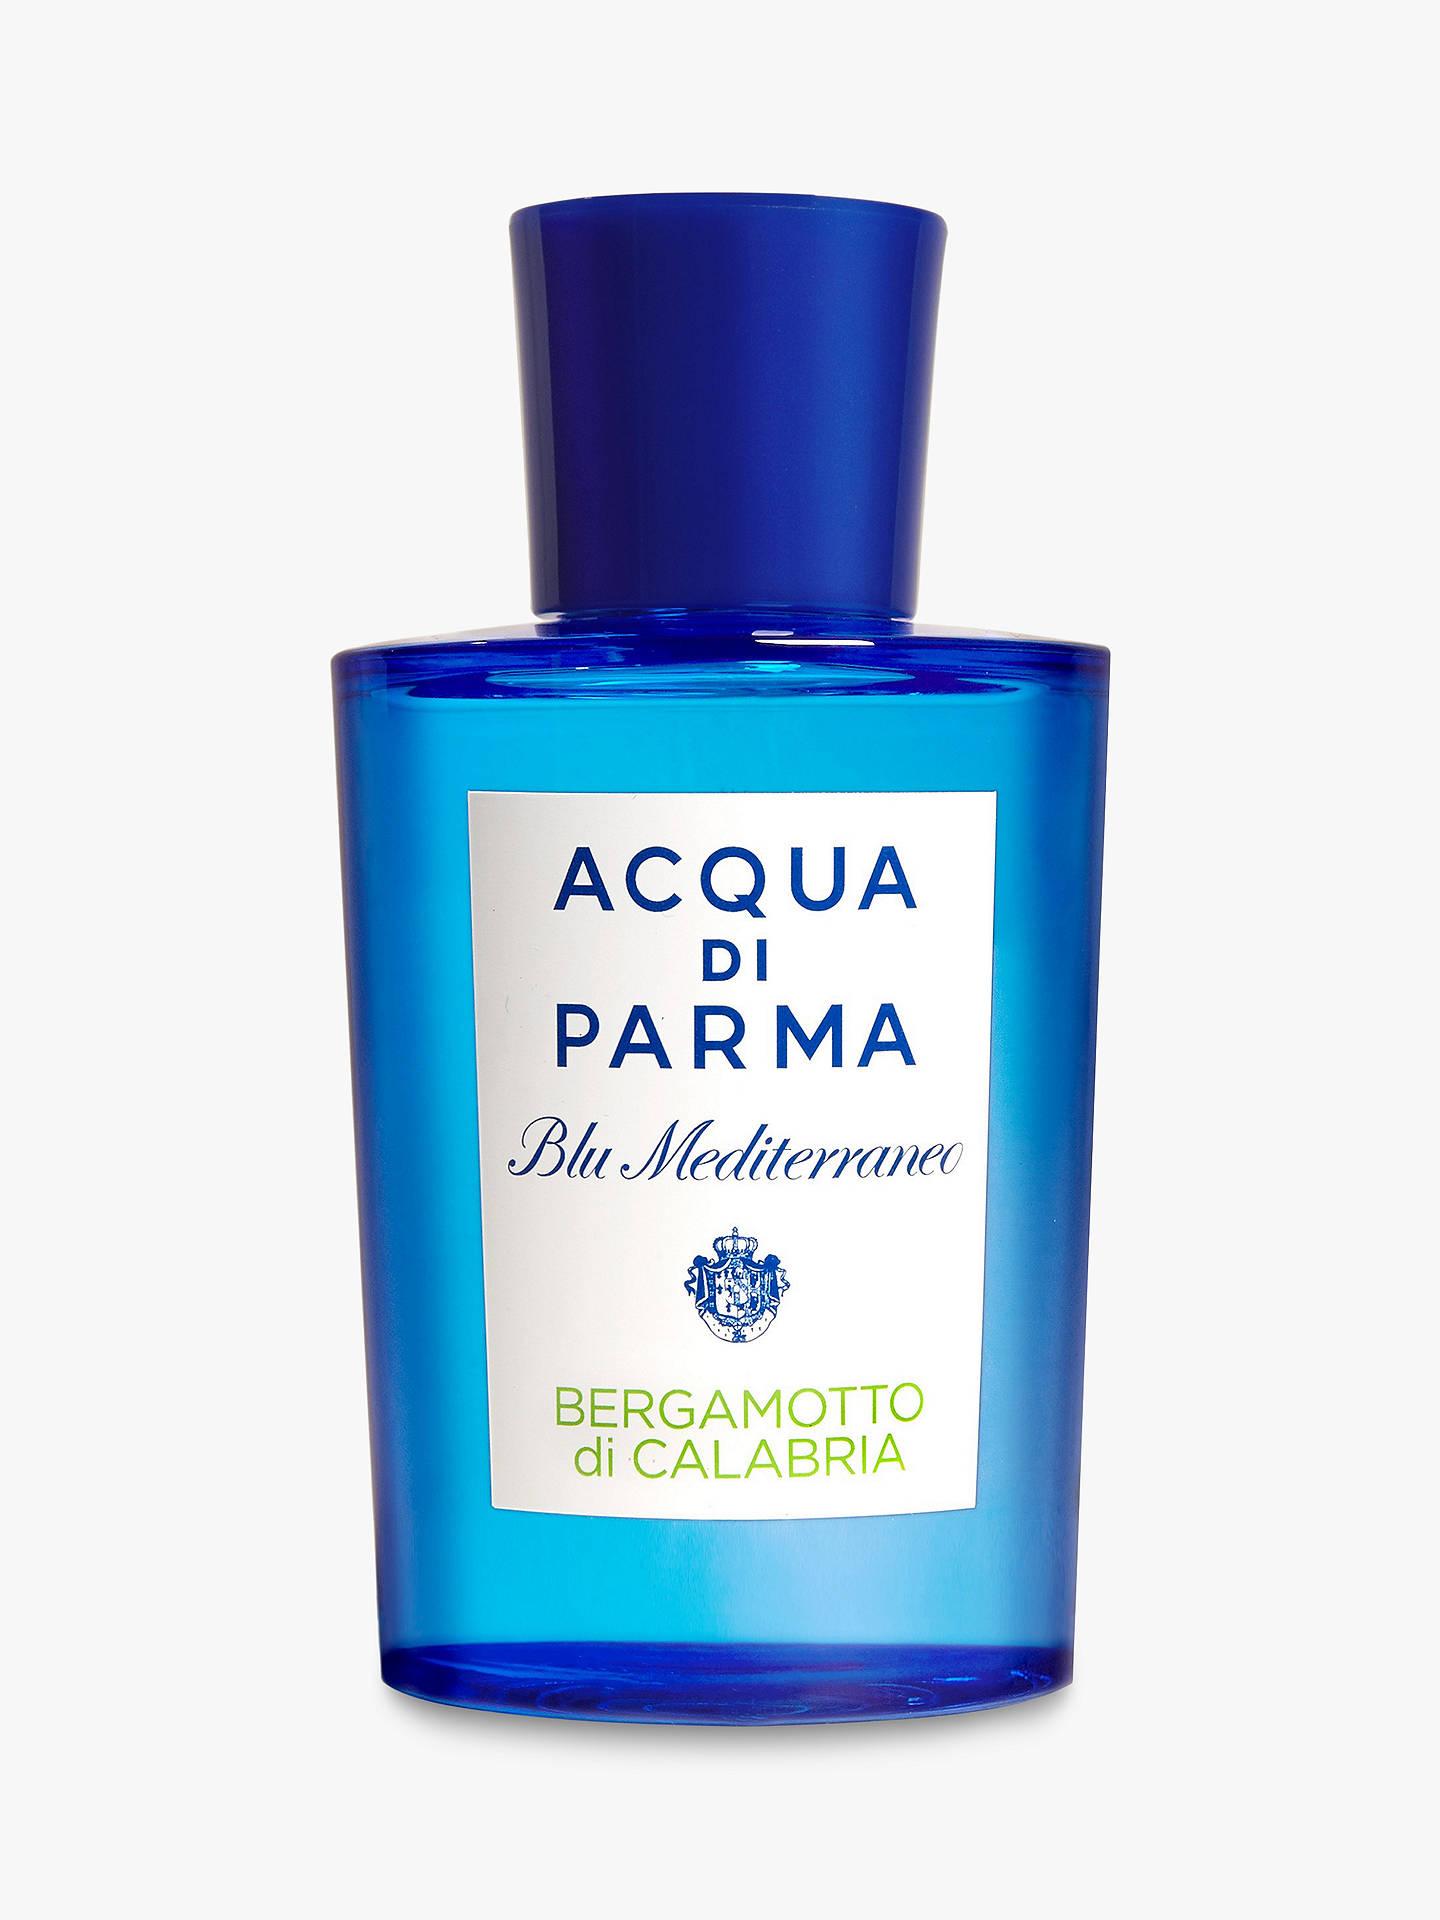 Acqua Di Parma Blu Mediterraneo Bergamotto Di Calabria Eau De